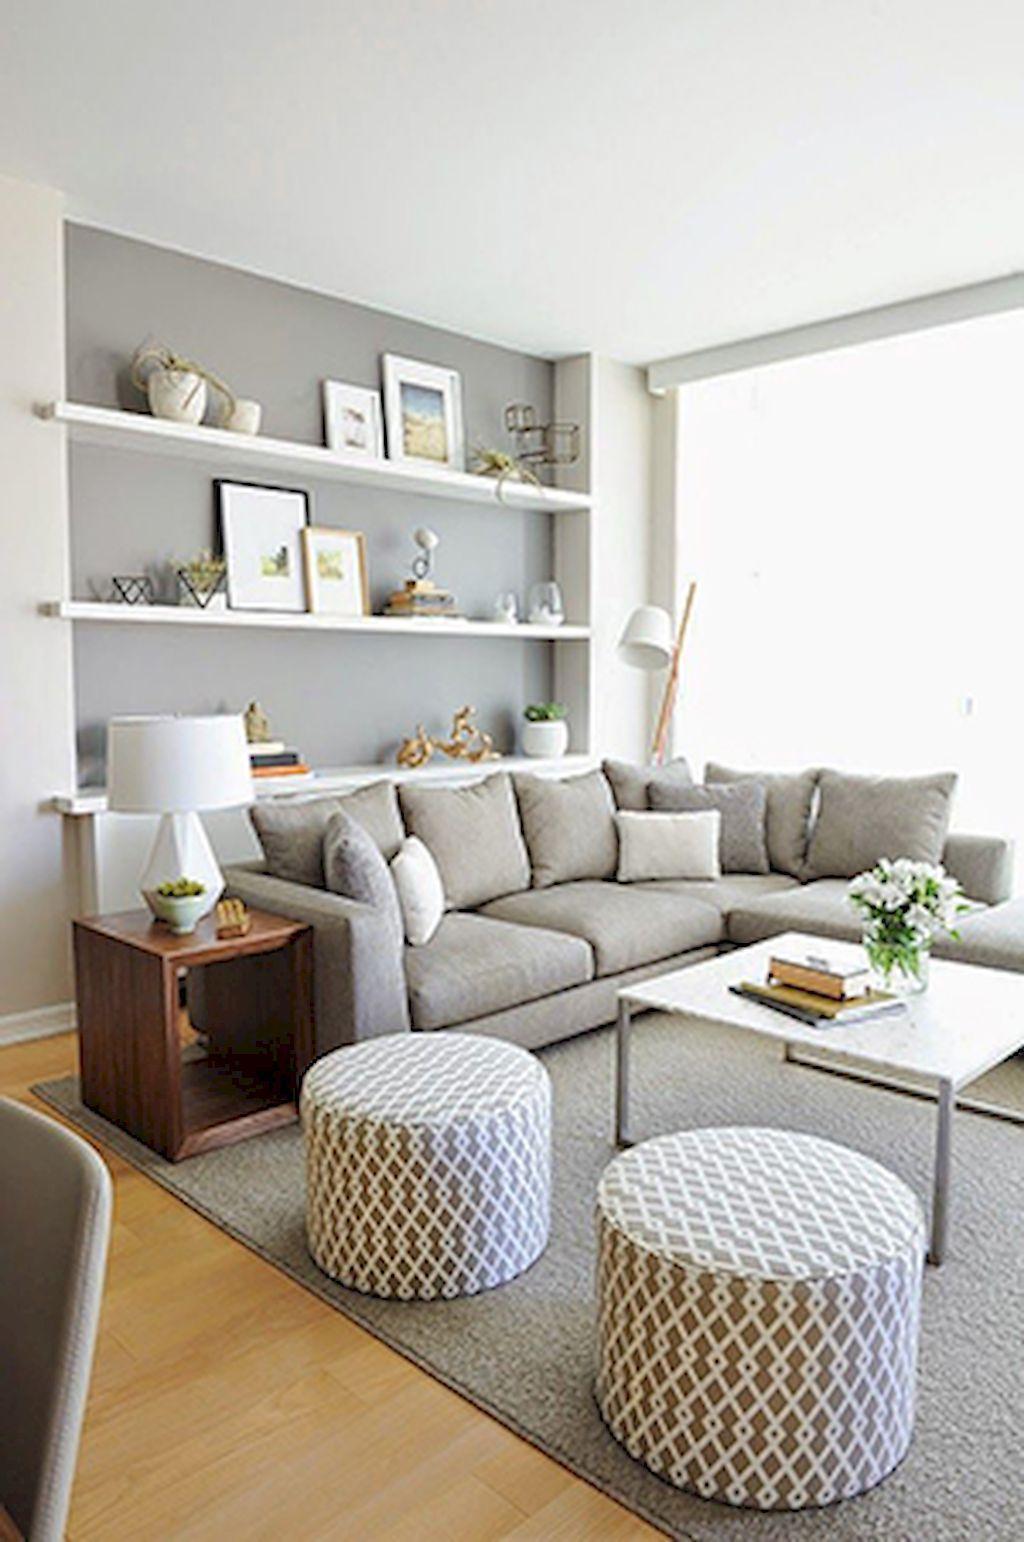 Stunning Small Living Room Decor Ideas On A Budget 3  Living Alluring Living Room Ideas On A Budget 2018